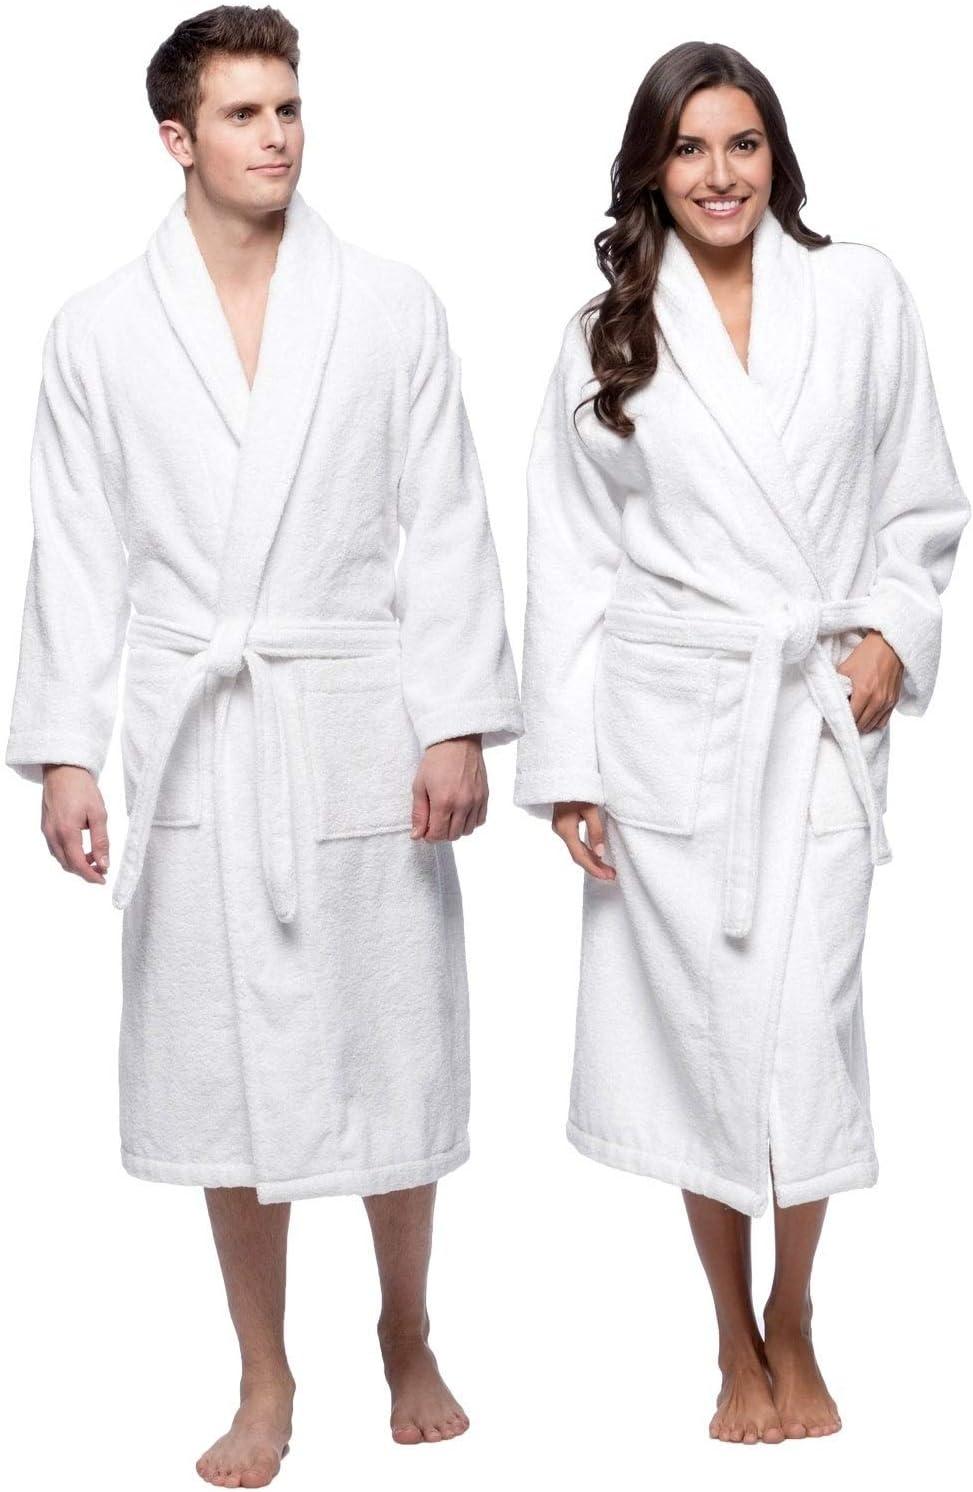 Terry Bathrobes Towel Unisex-Bathrobes for Men-Bathrobes for Women-Lightweight Bathrobe Side Pockets-White Bathrobes Unisex Hotel Quality-Luxury Bathrobe -Absorbent Soft Combed Cotton Plush Bathrobe: Home & Kitchen